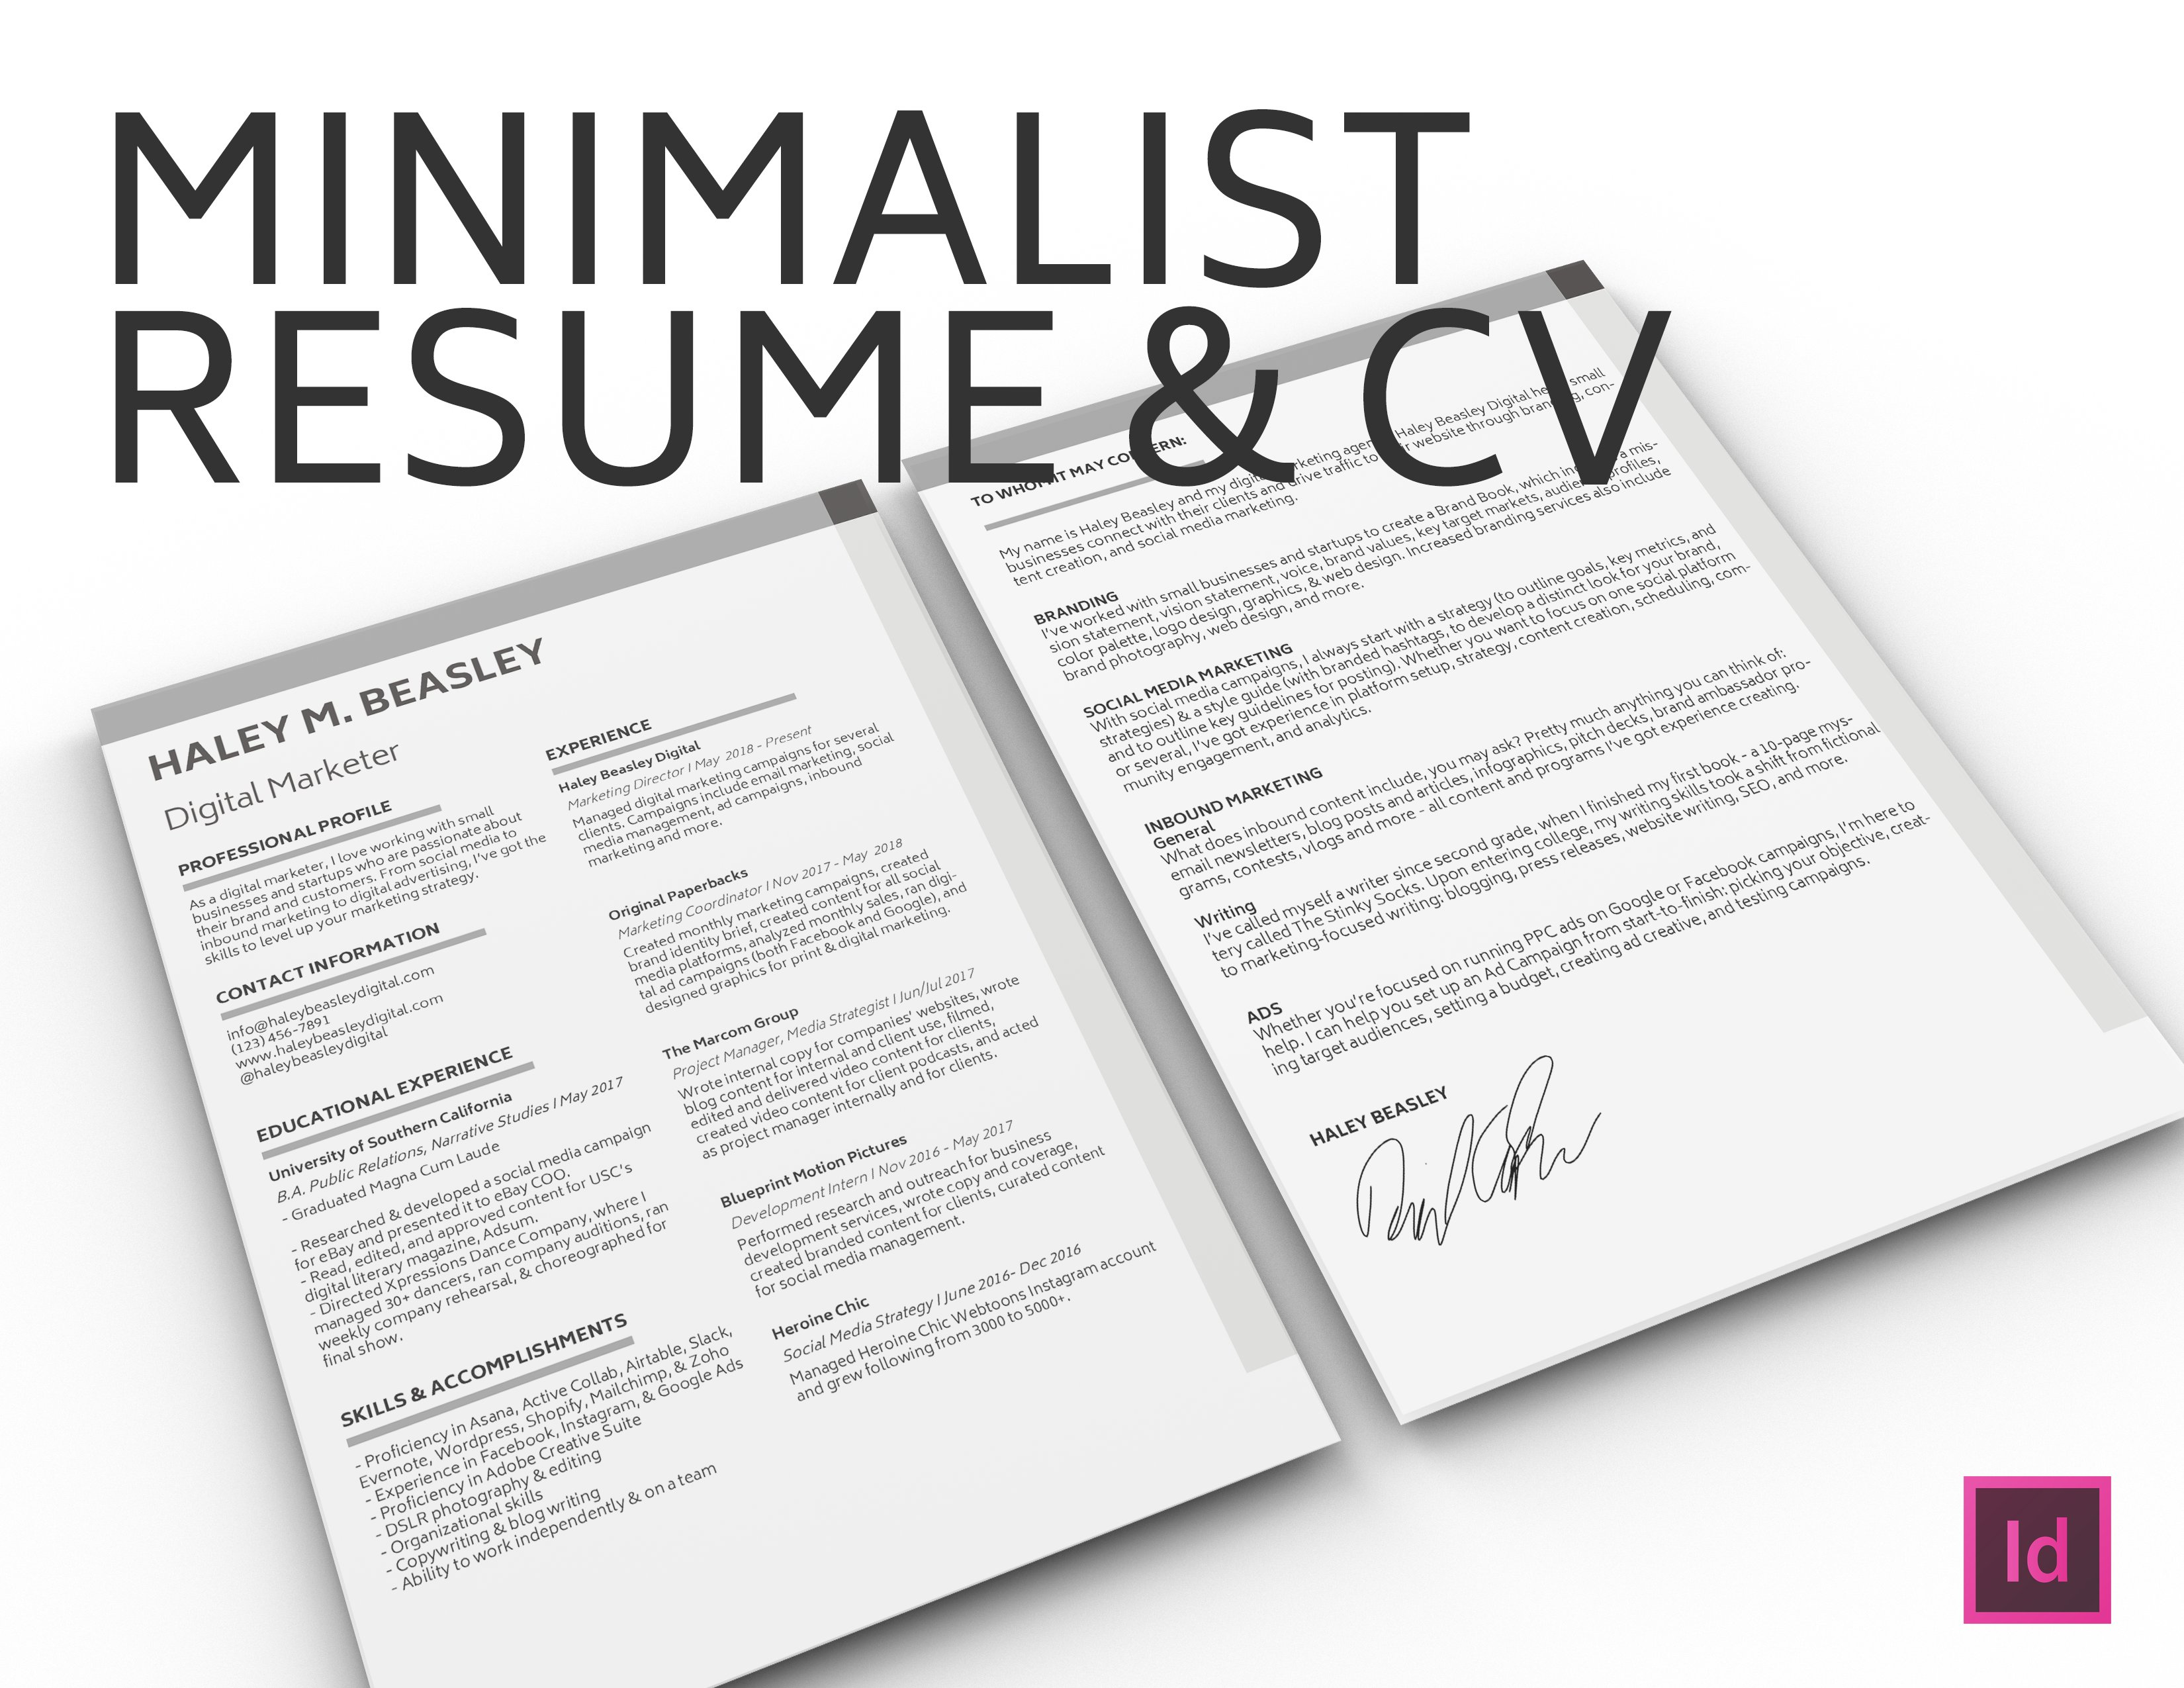 Minimalist Resume & Cover Letter